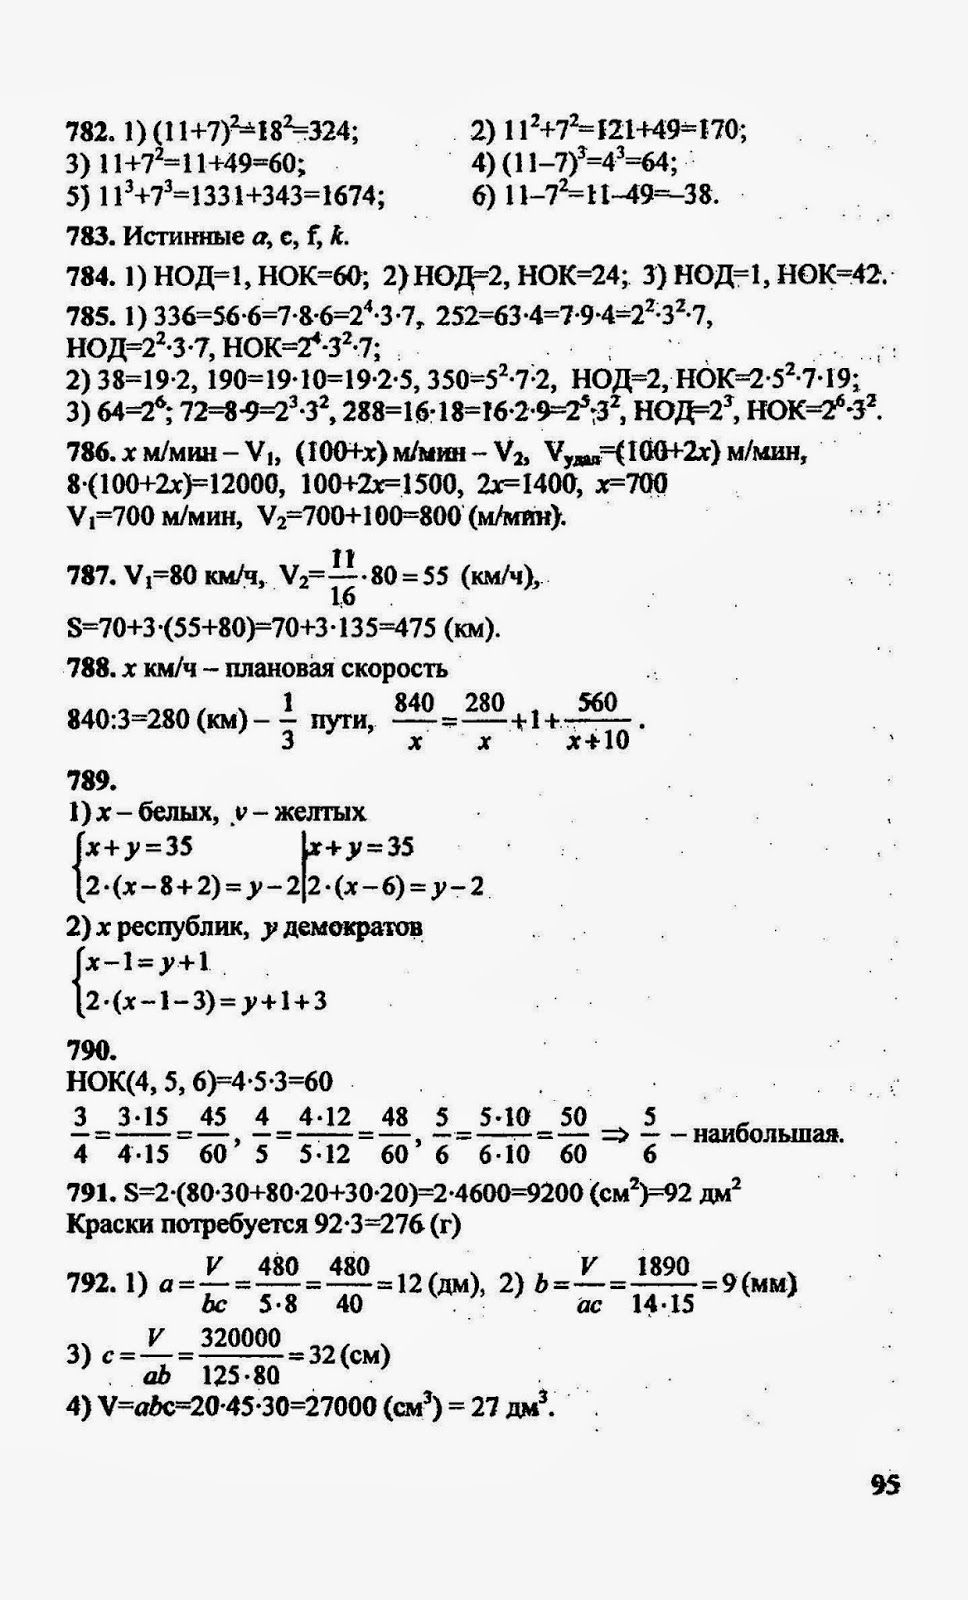 Габриелян 10 класс гдз 2003